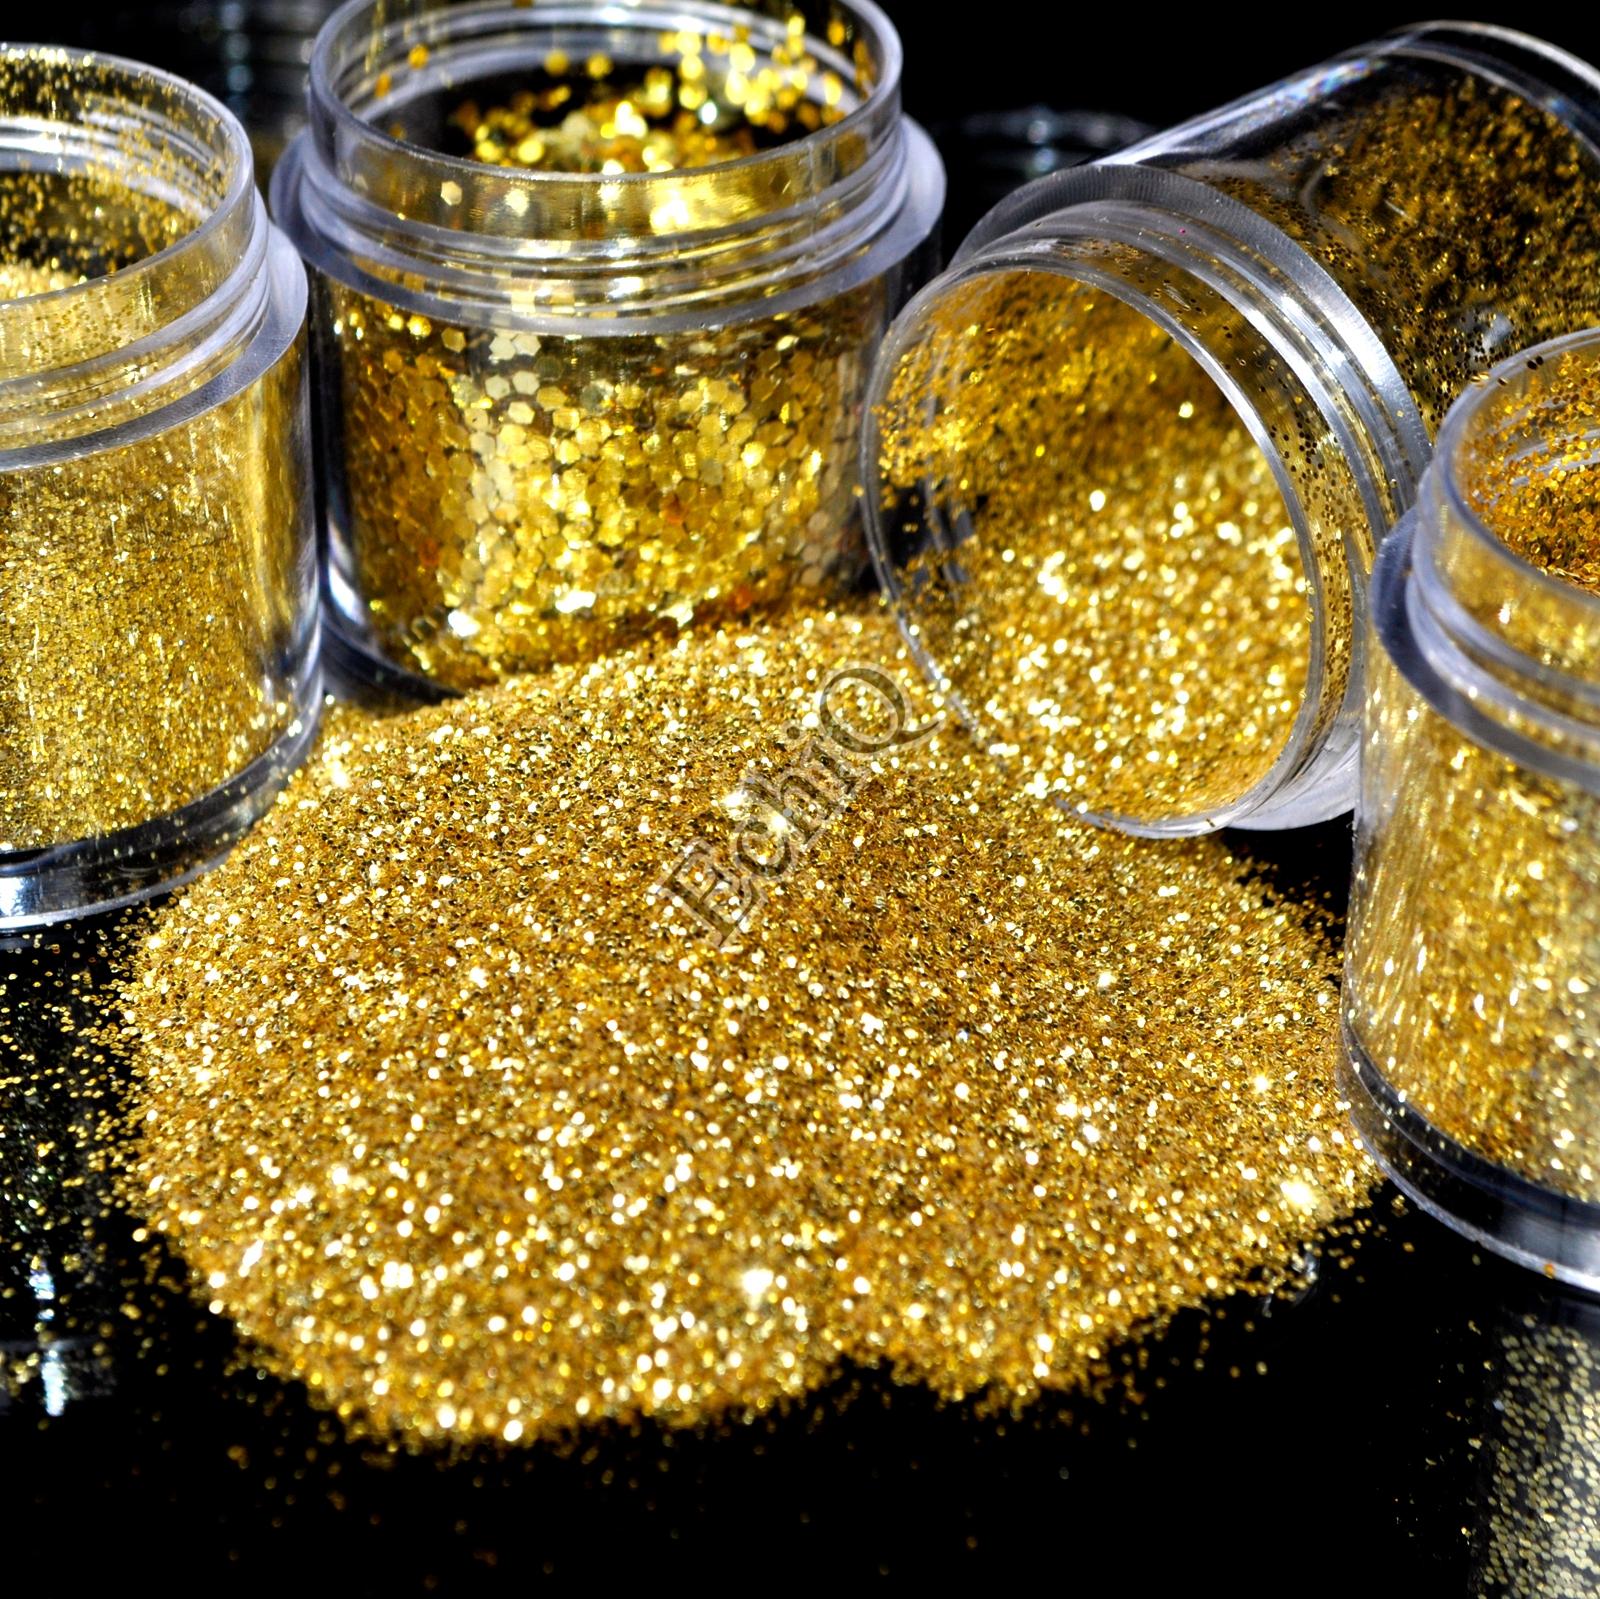 4 Sizes Pure Gold Nail Glitter Powder Shimmer Hexagon Nail Art DIY Small Glitter Dust Powder Sequins Sheet in Clear Jar(China (Mainland))